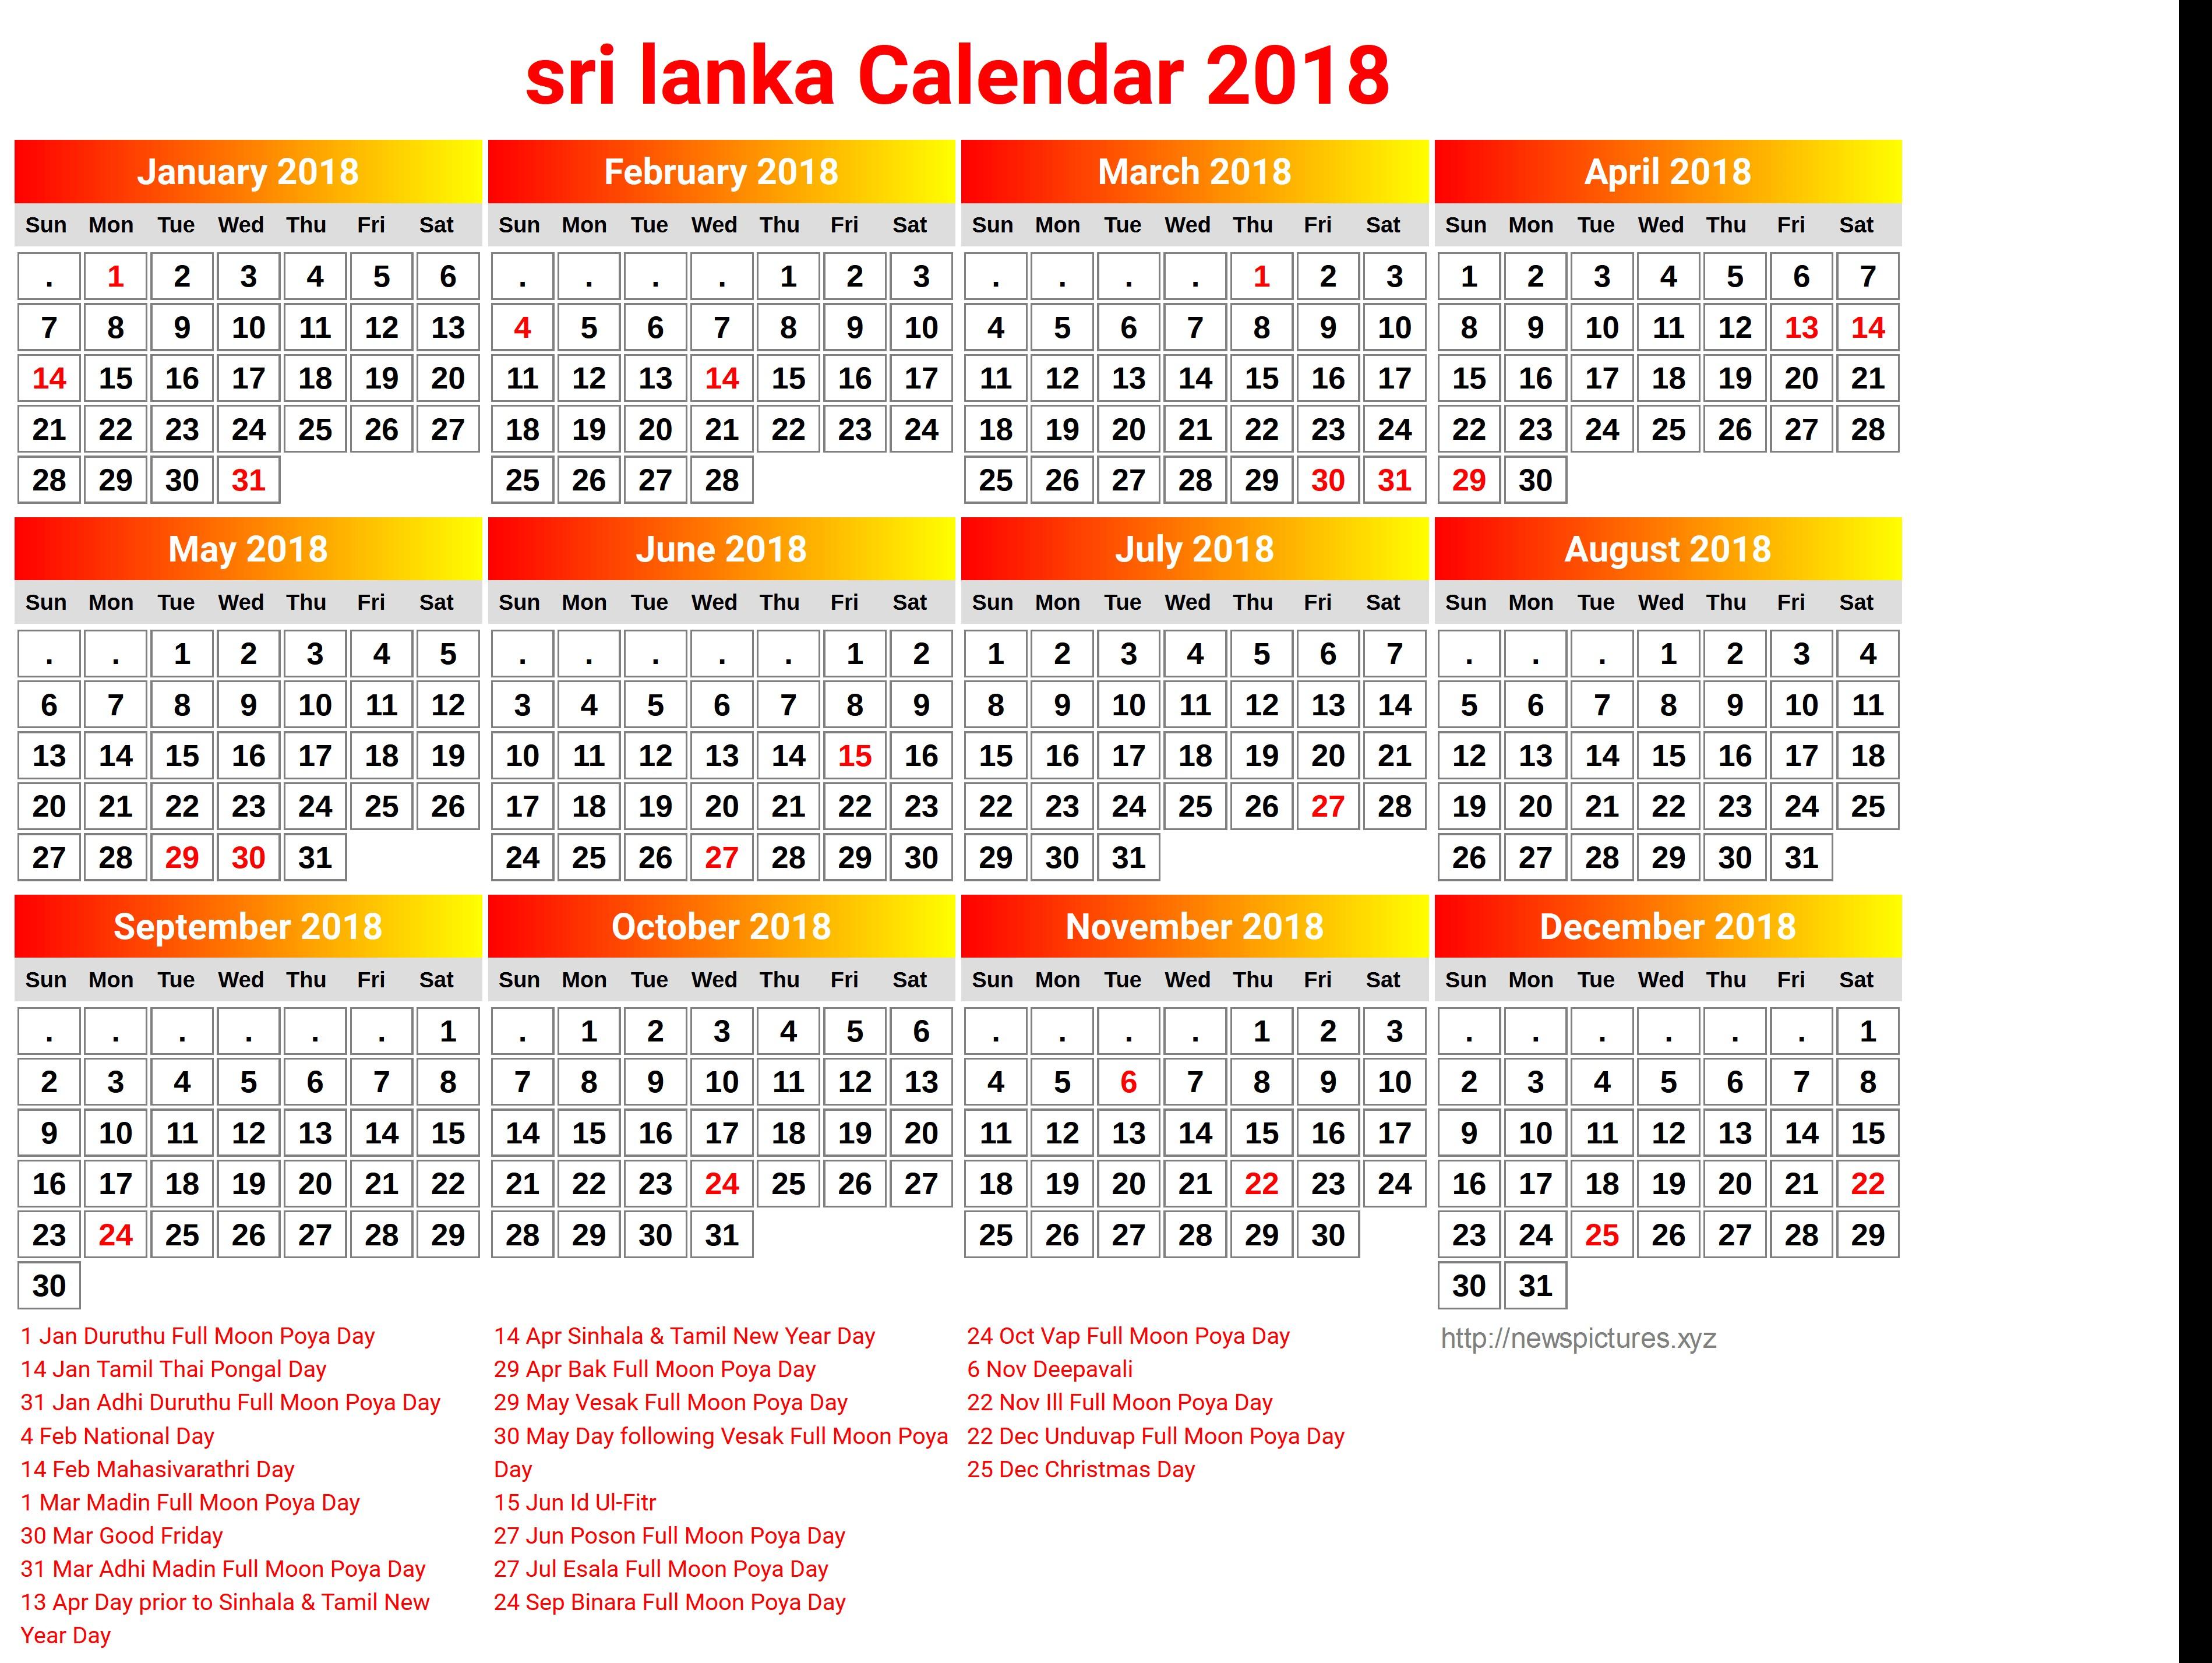 Calender sri lanka with calendar public holidays 3797x2855 Printable maldives 2018 calendar indonesia newspictures